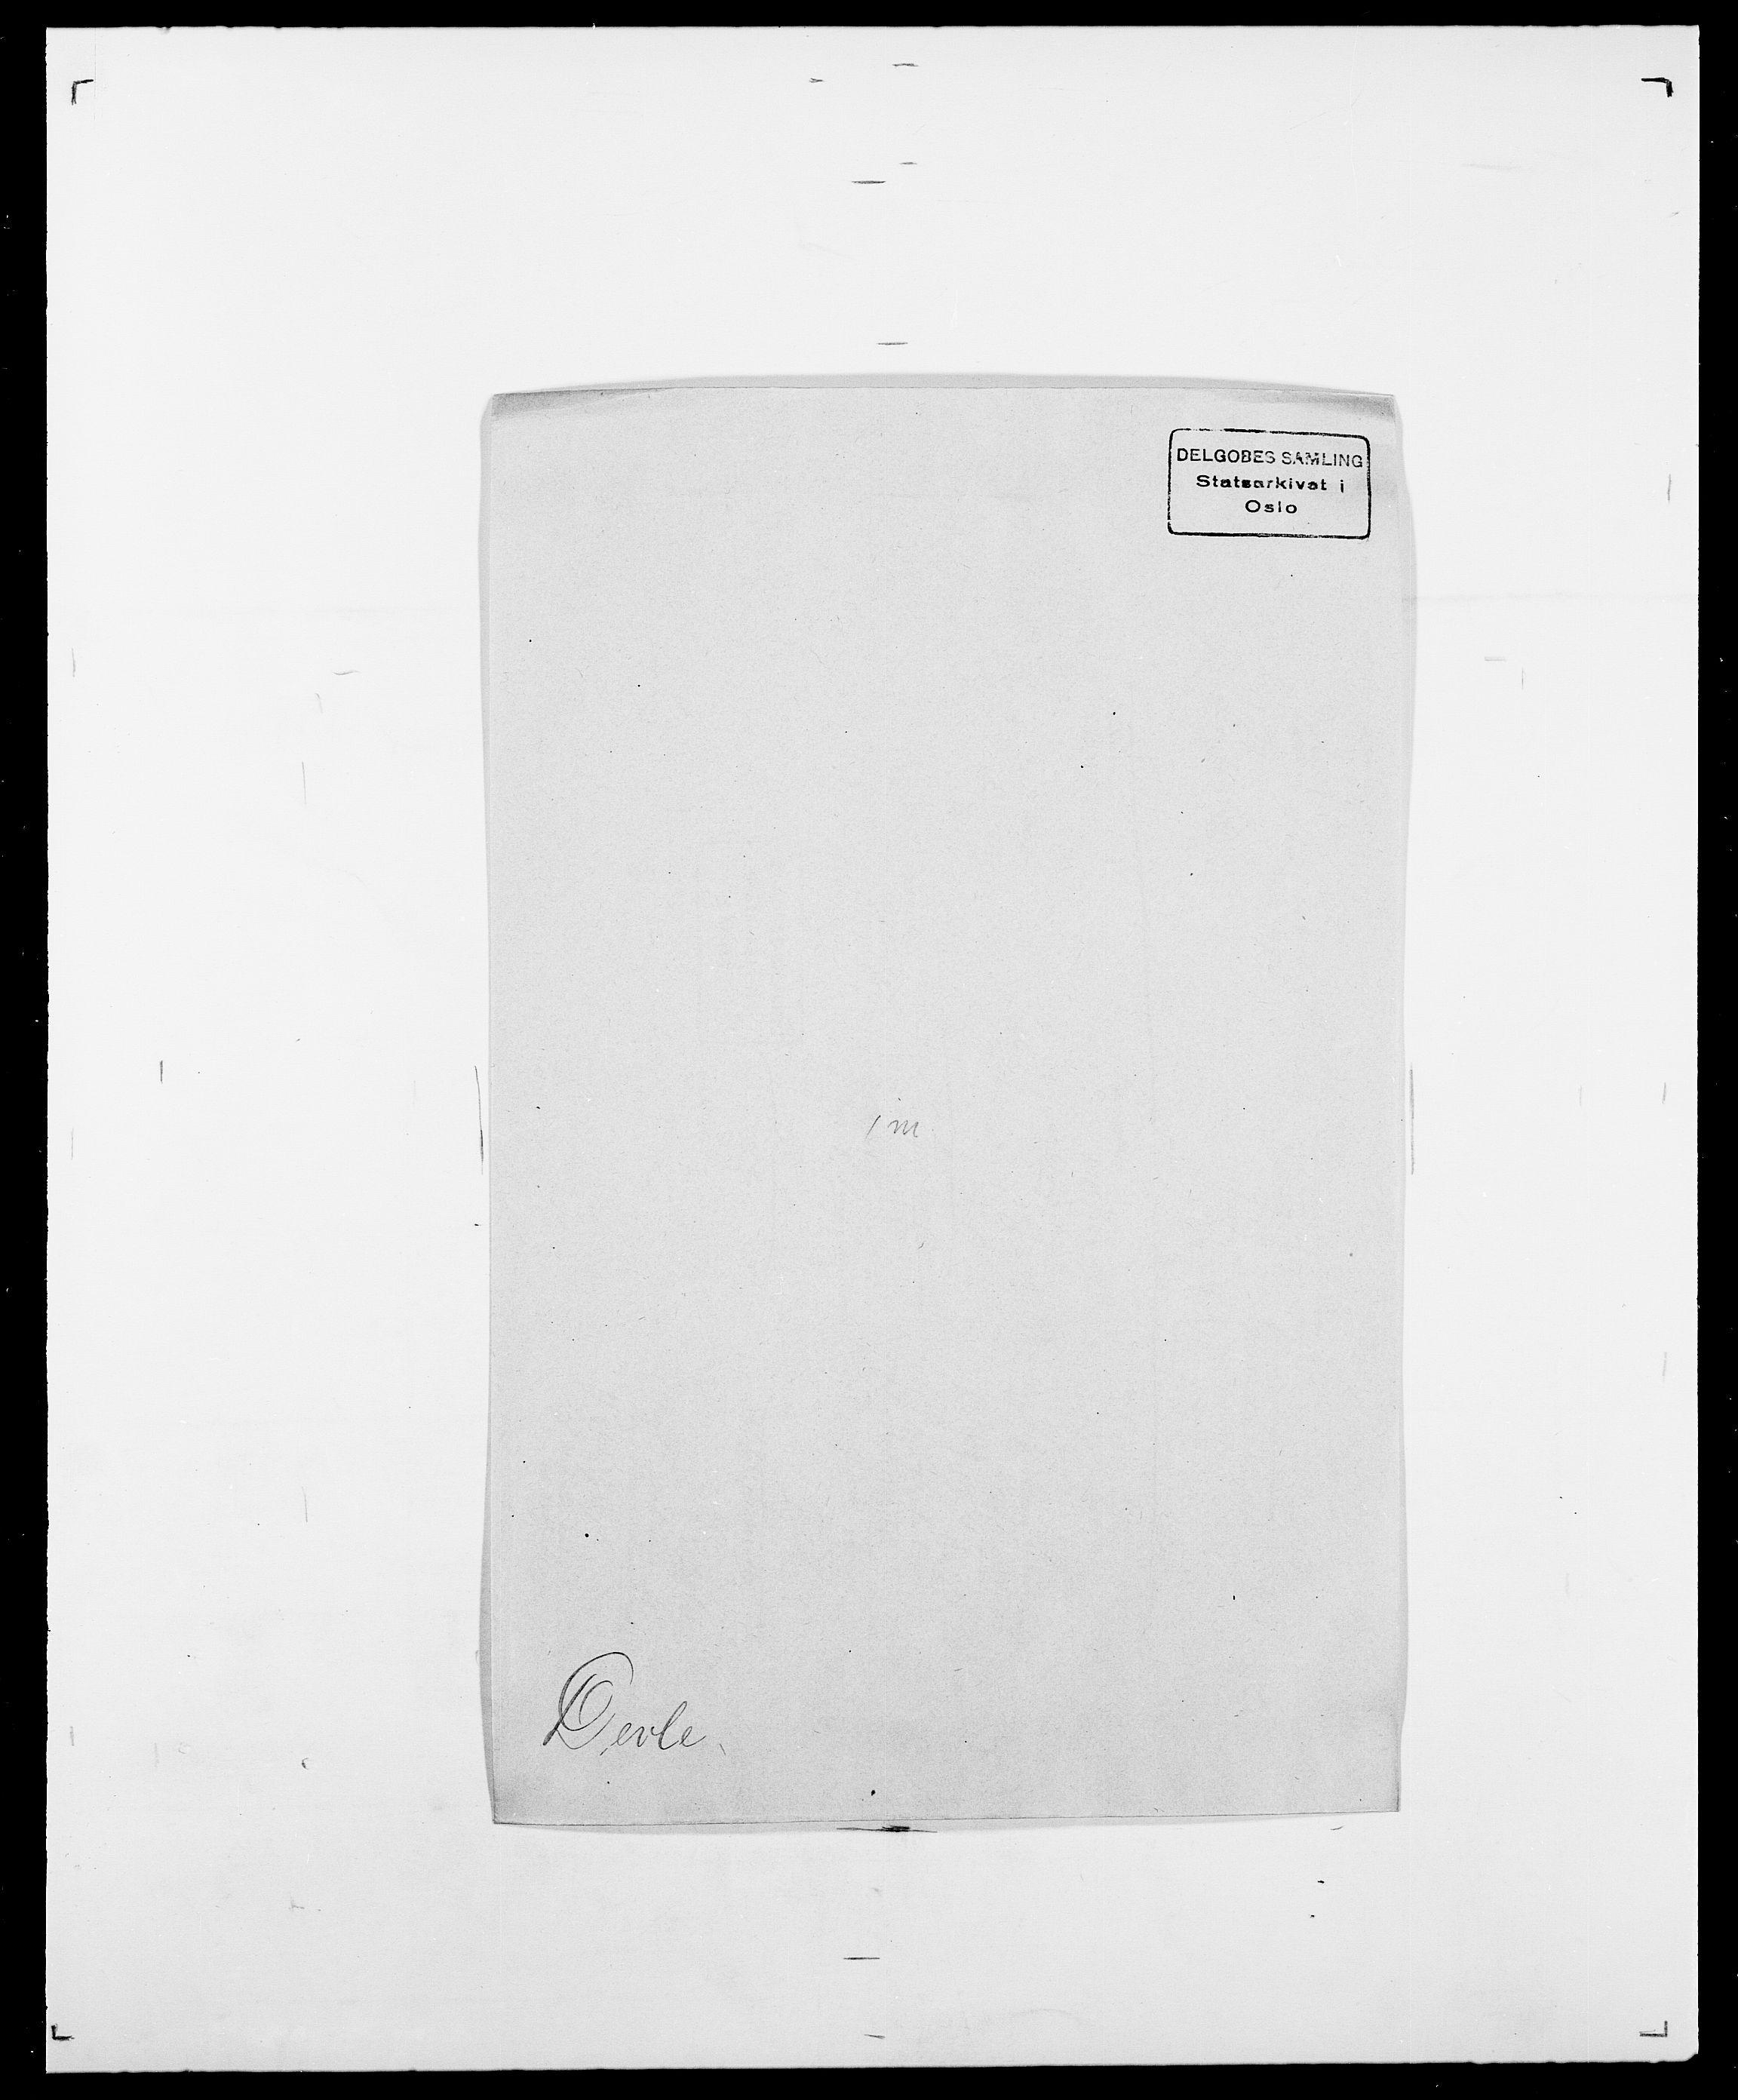 SAO, Delgobe, Charles Antoine - samling, D/Da/L0009: Dahl - v. Düren, s. 508